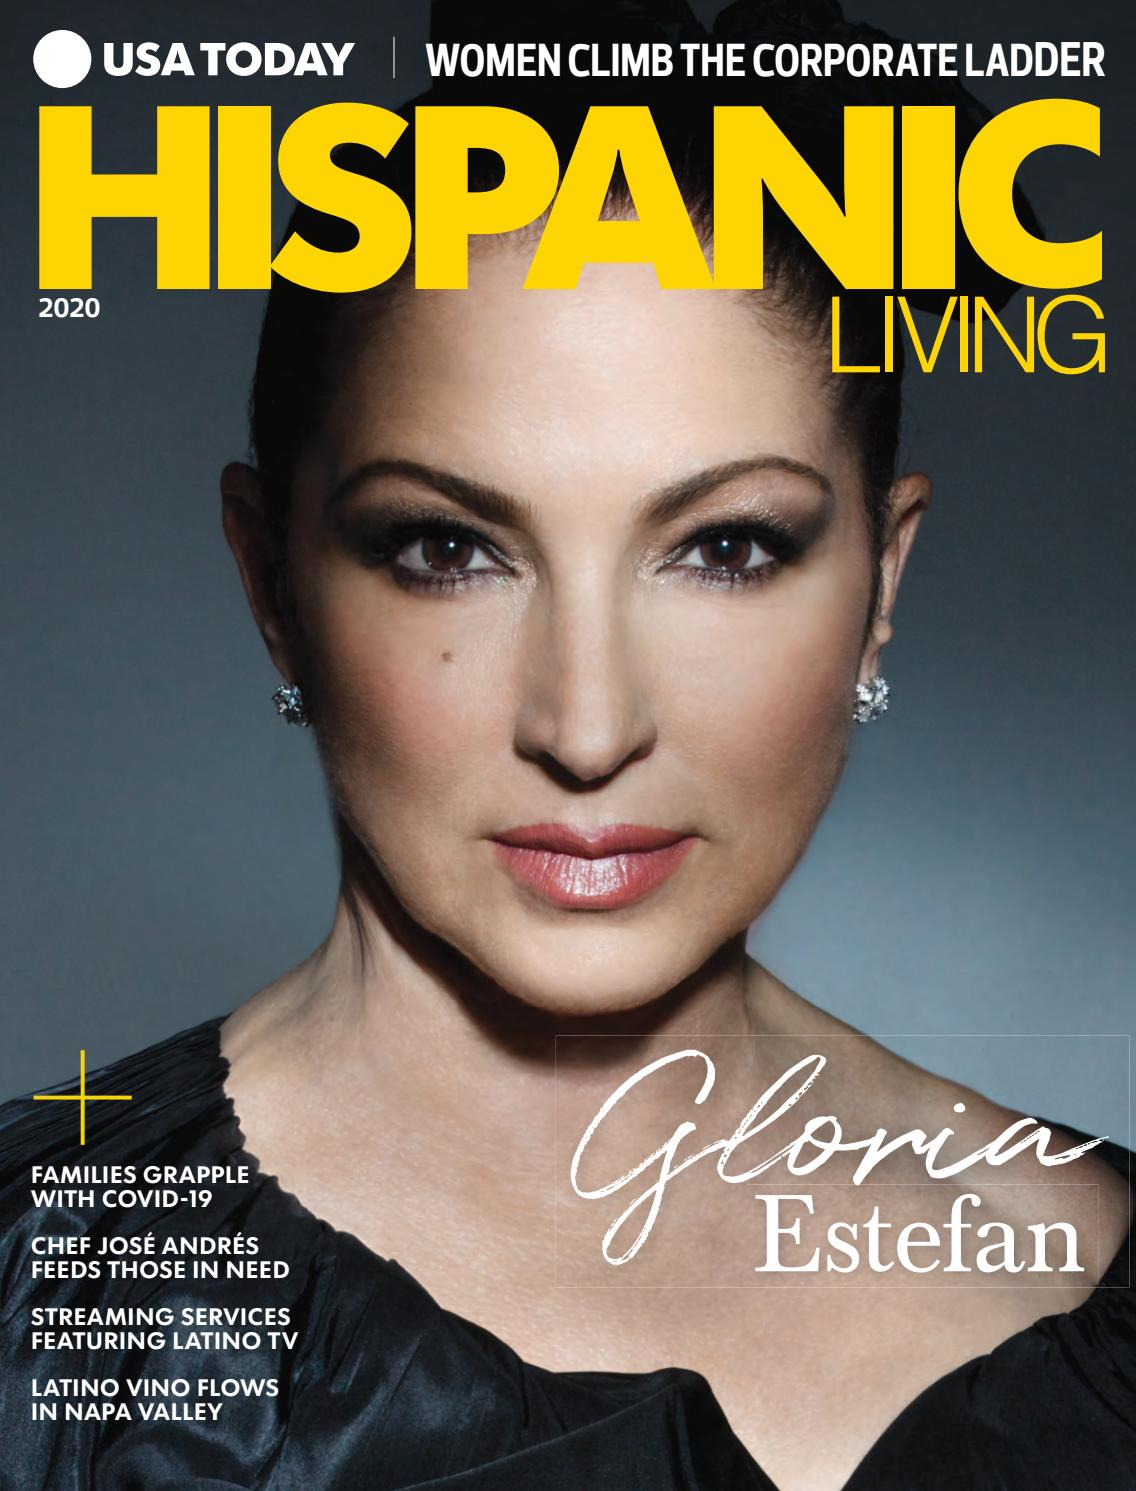 HISPANIC LIVING 2020 by STUDIO Gannett - issuu